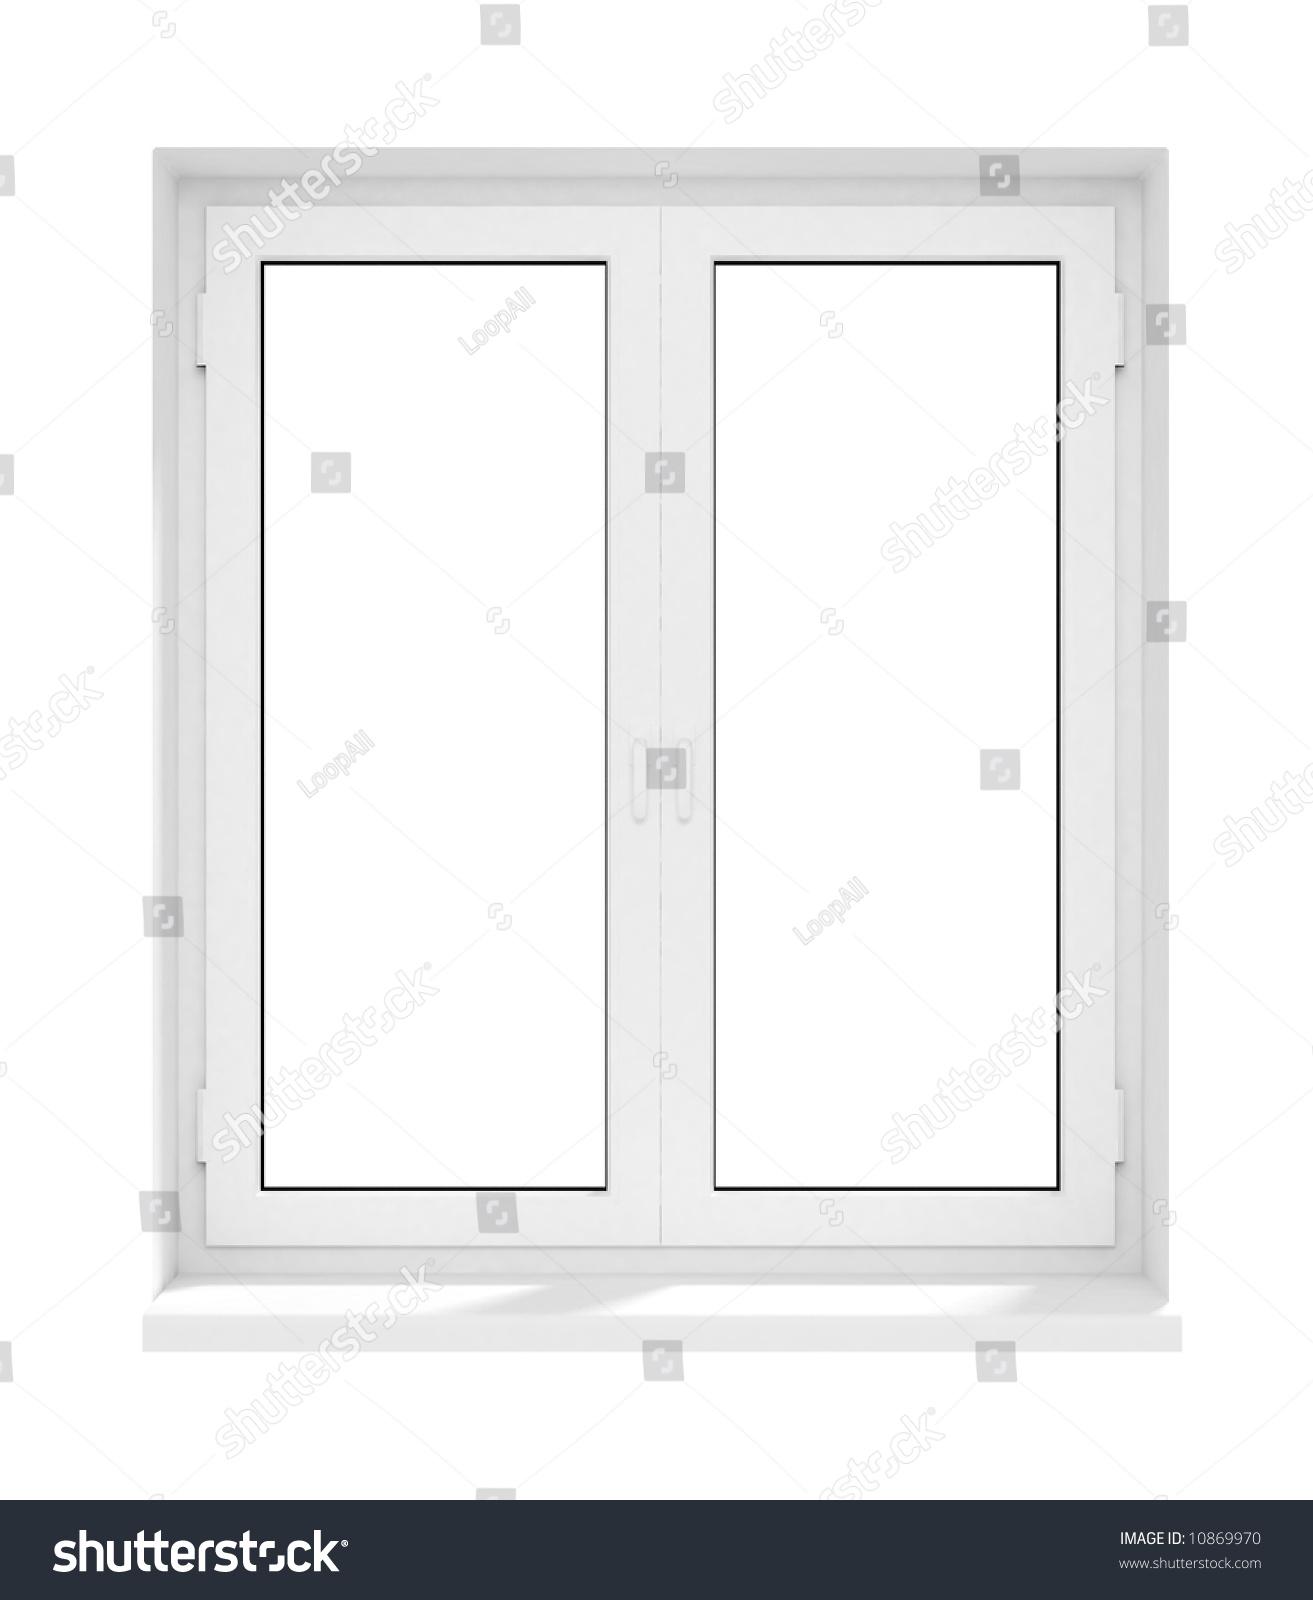 New Closed Plastic Glass Window Frame Stock Illustration 10869970 ...